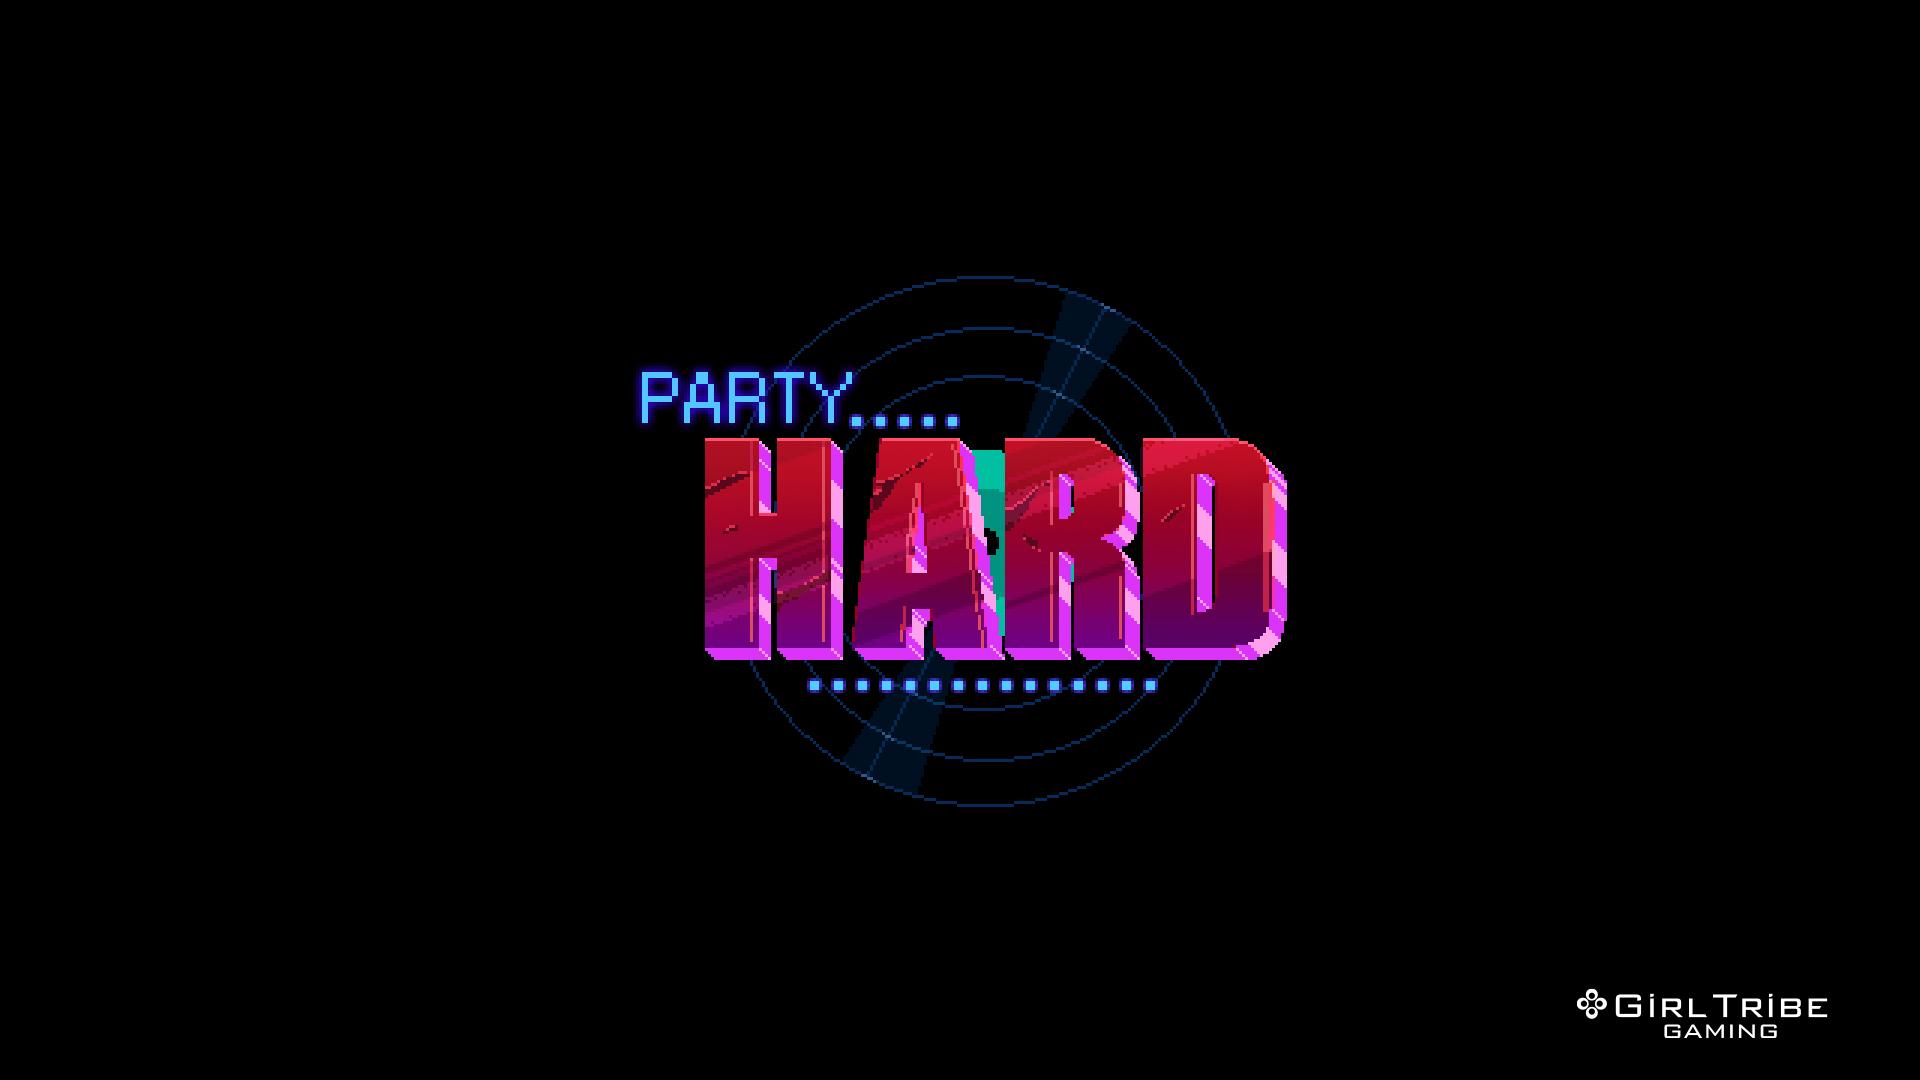 Party-Hard-Screenshot-4-w.jpg